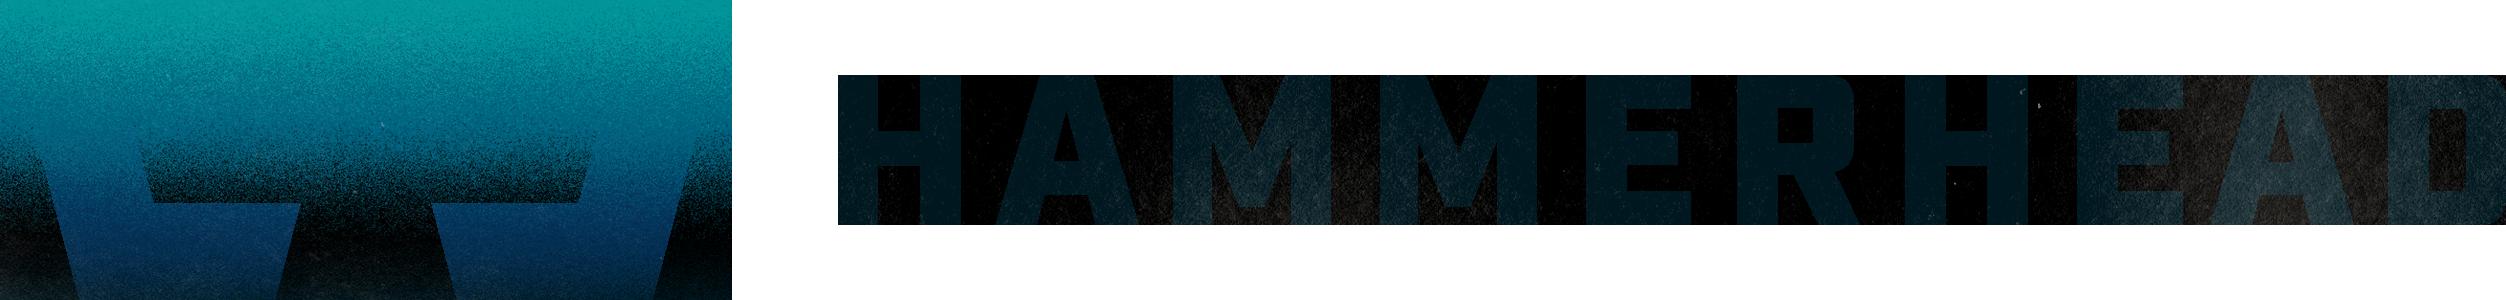 Hammerhead VR logo